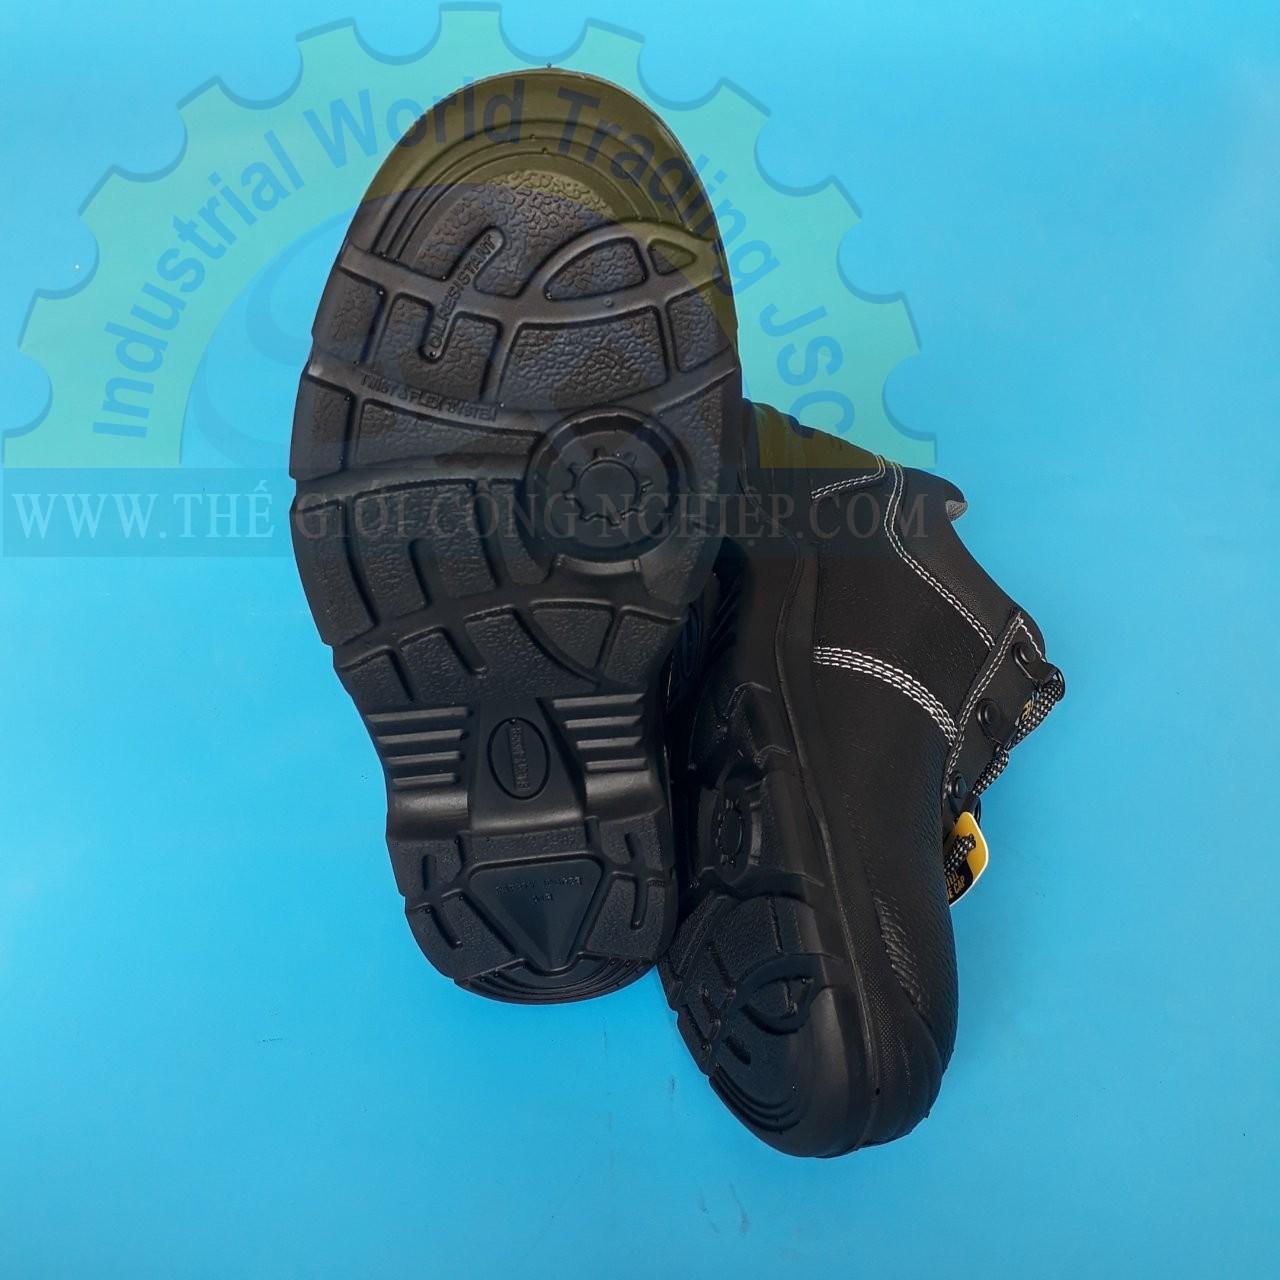 Giày bảo hộ lao động size 39  TGCN-34892 SAFETYJOGGER